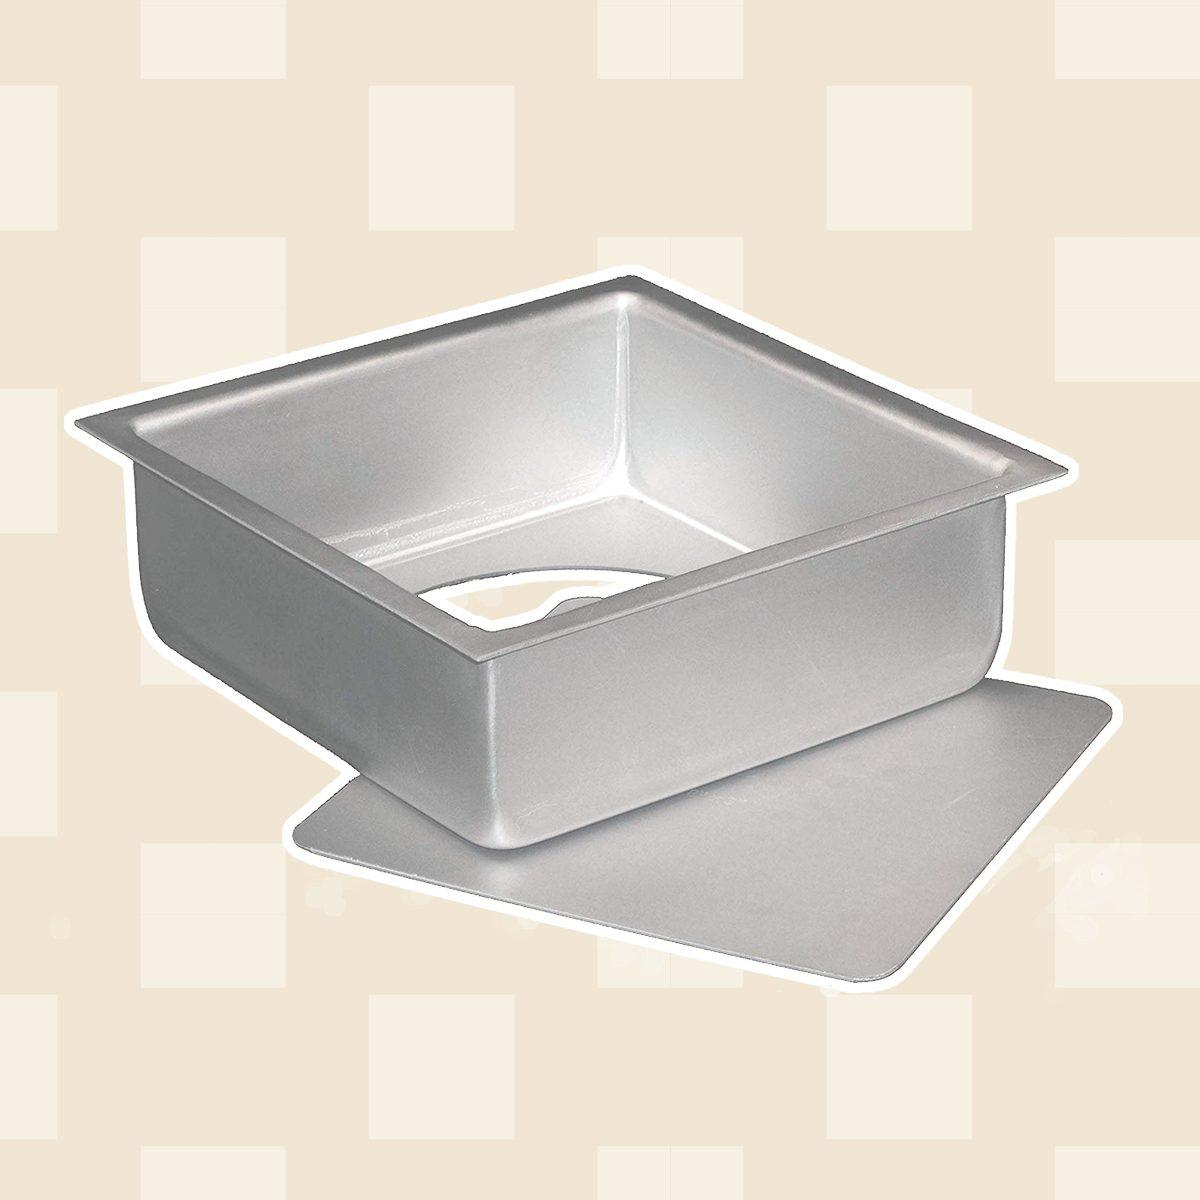 Aluminum Square Cheesecake Pan